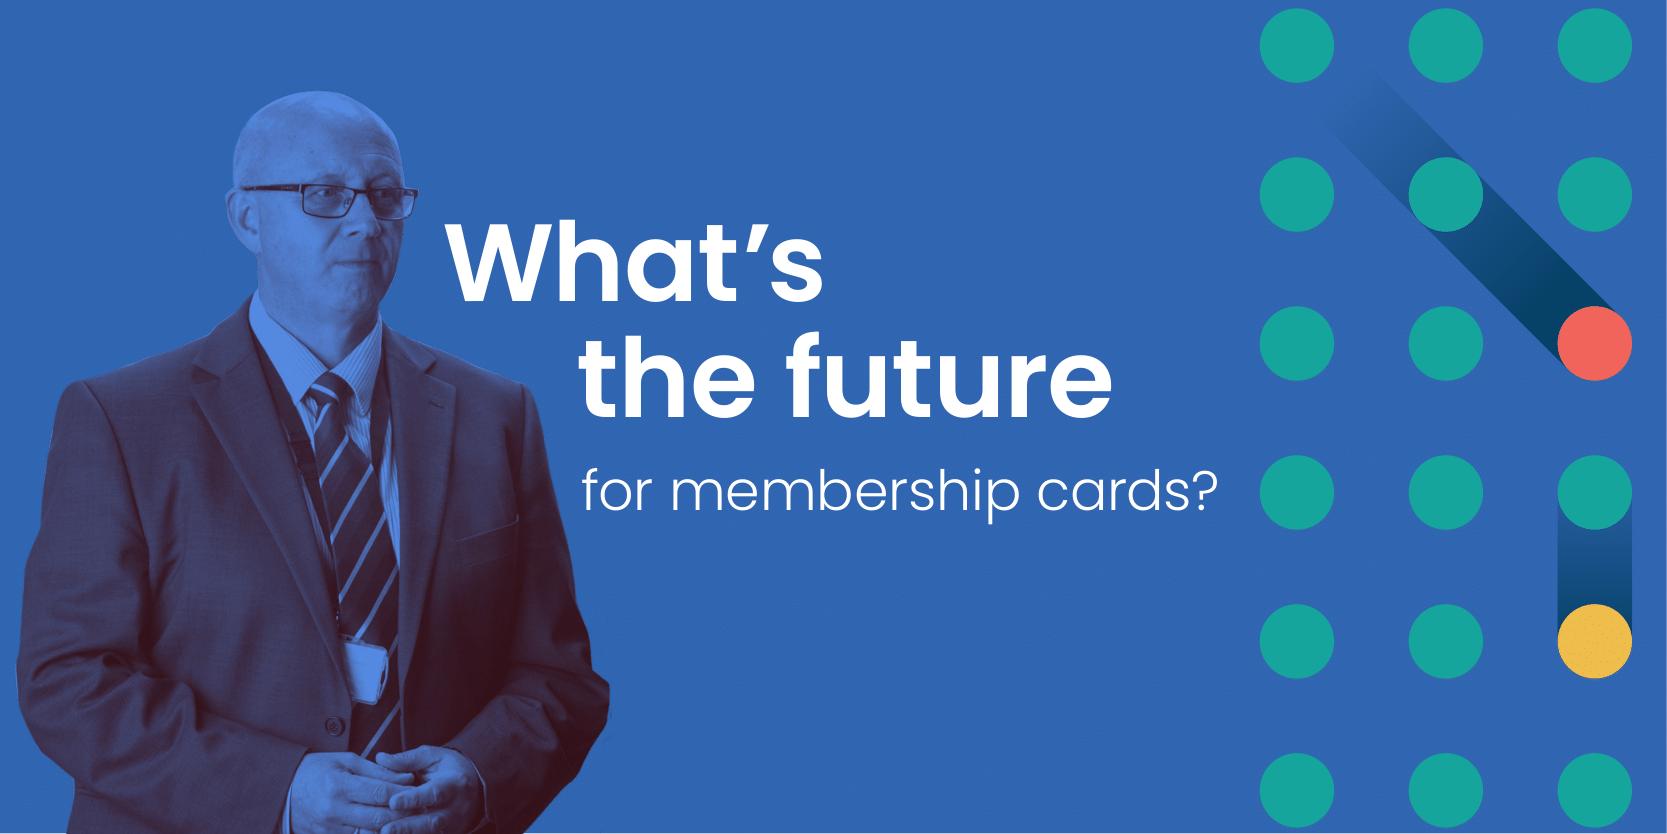 The future of membership cards